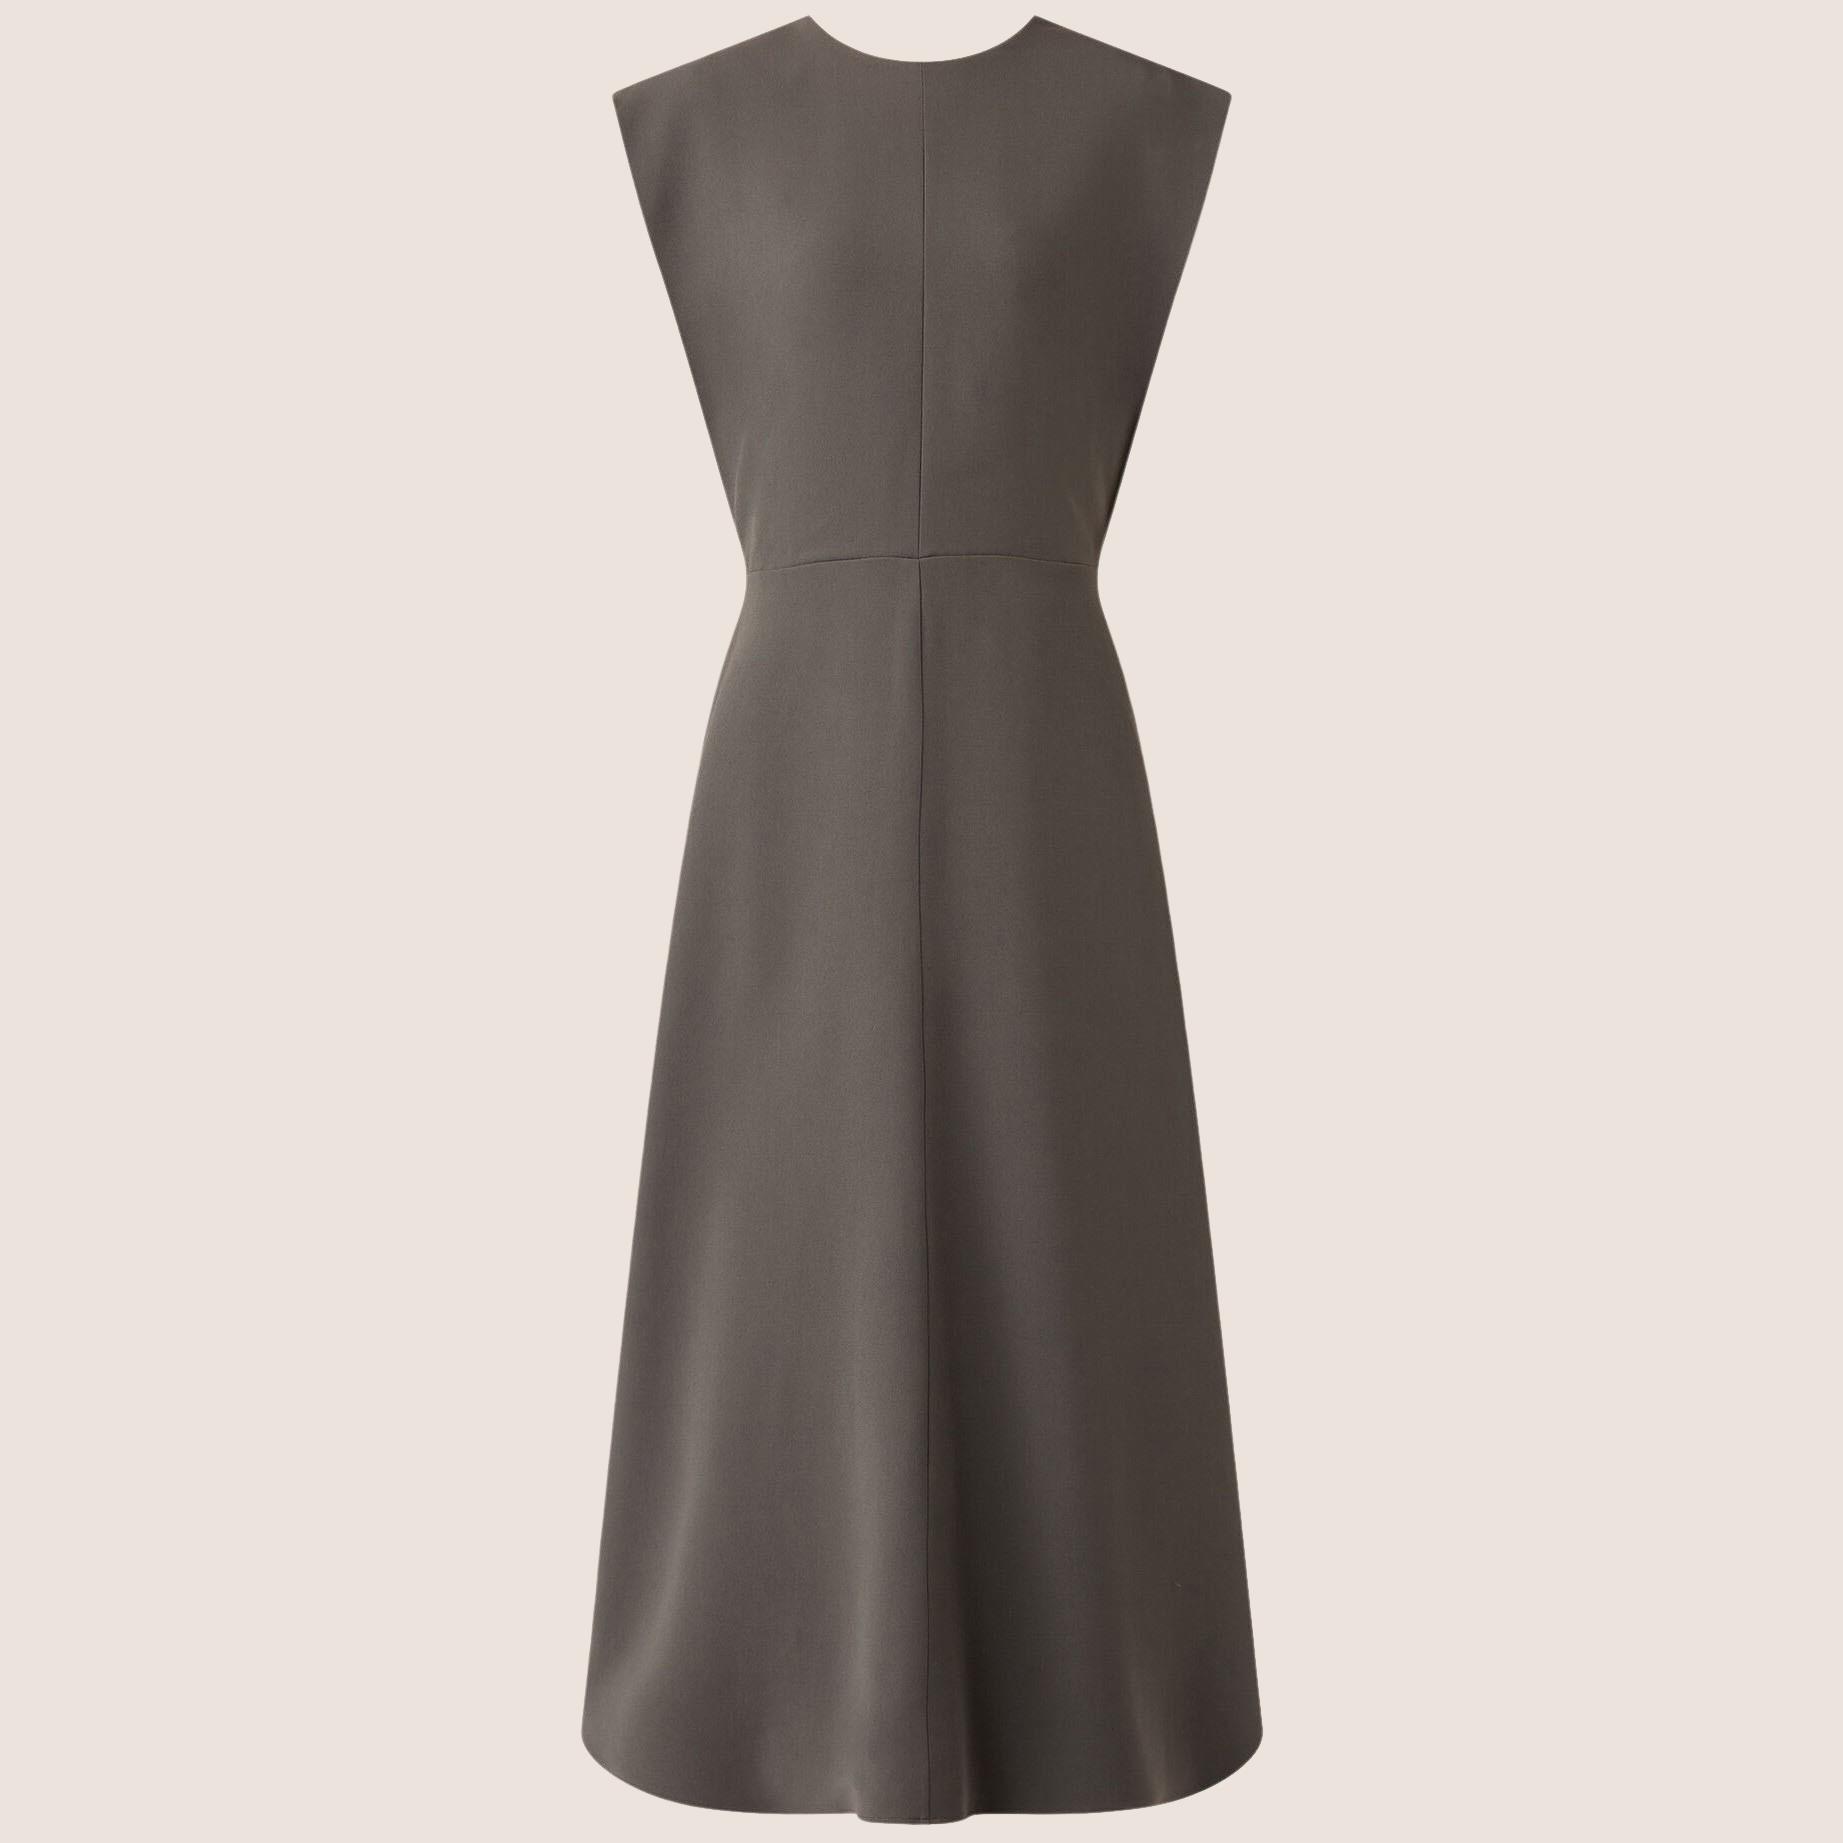 Delannoy Dress